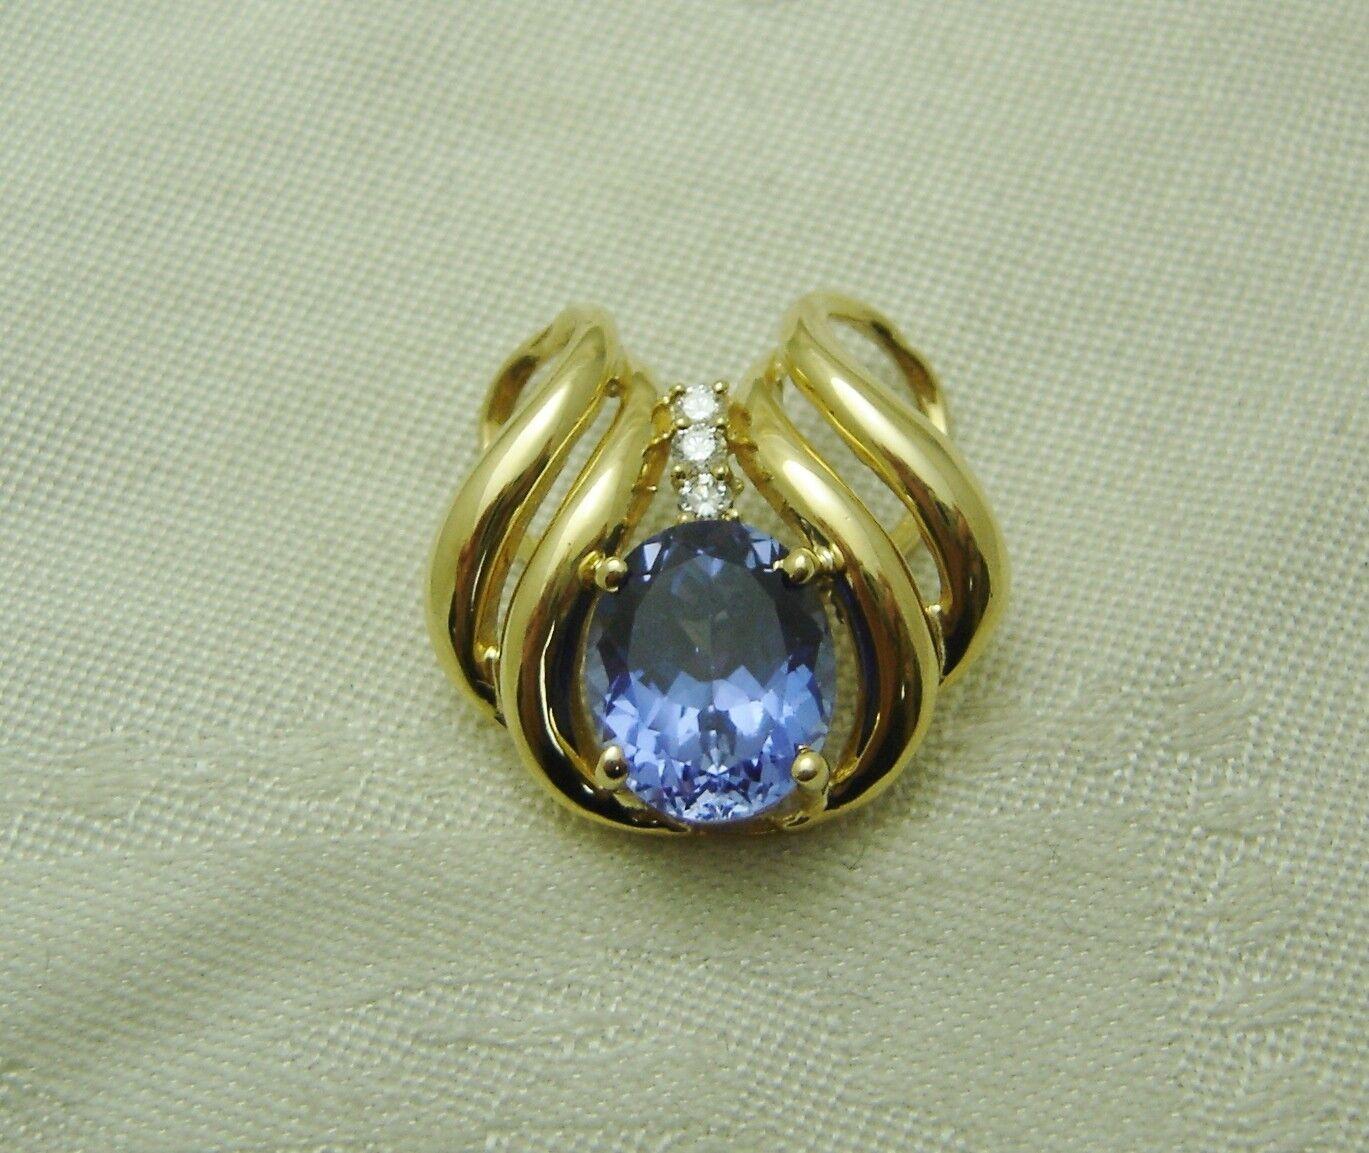 14K YELLOW gold SAPPHIRE & 3 DIAMOND SLIDE PENDANT  AWESOME N260-L